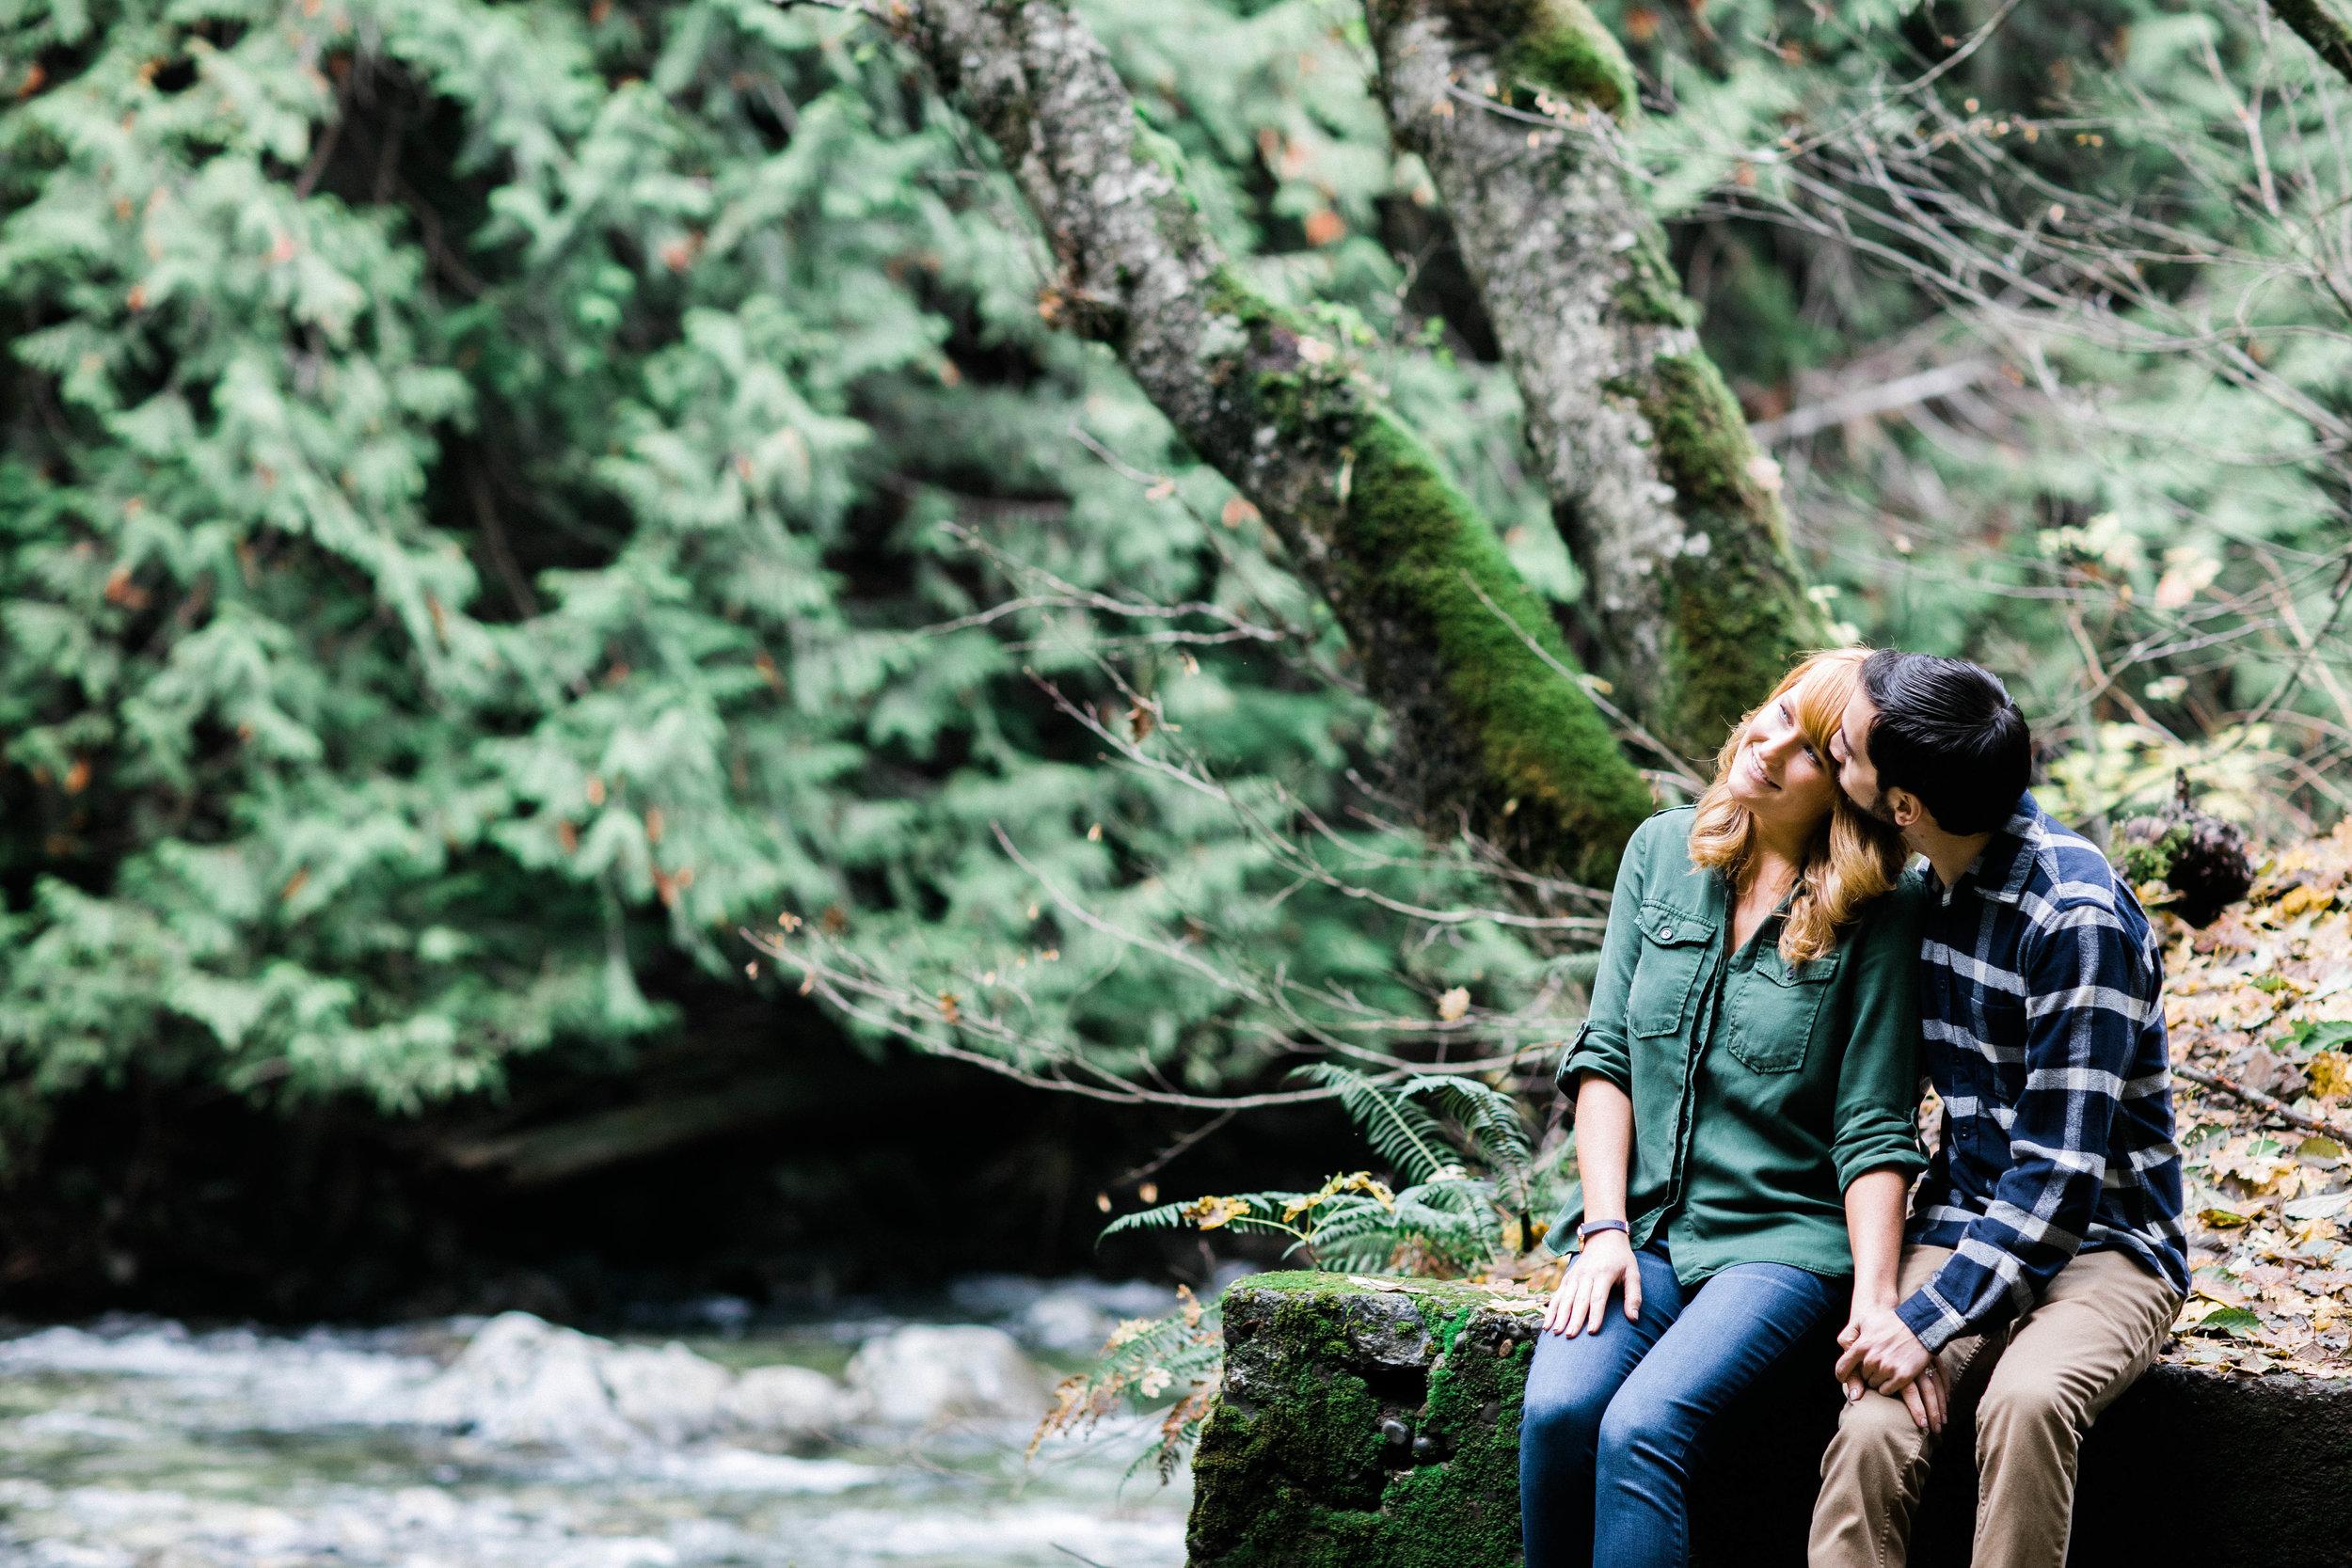 Ryan+Nicole_Franklin+Falls+Engagement_APW2016_2.JPG